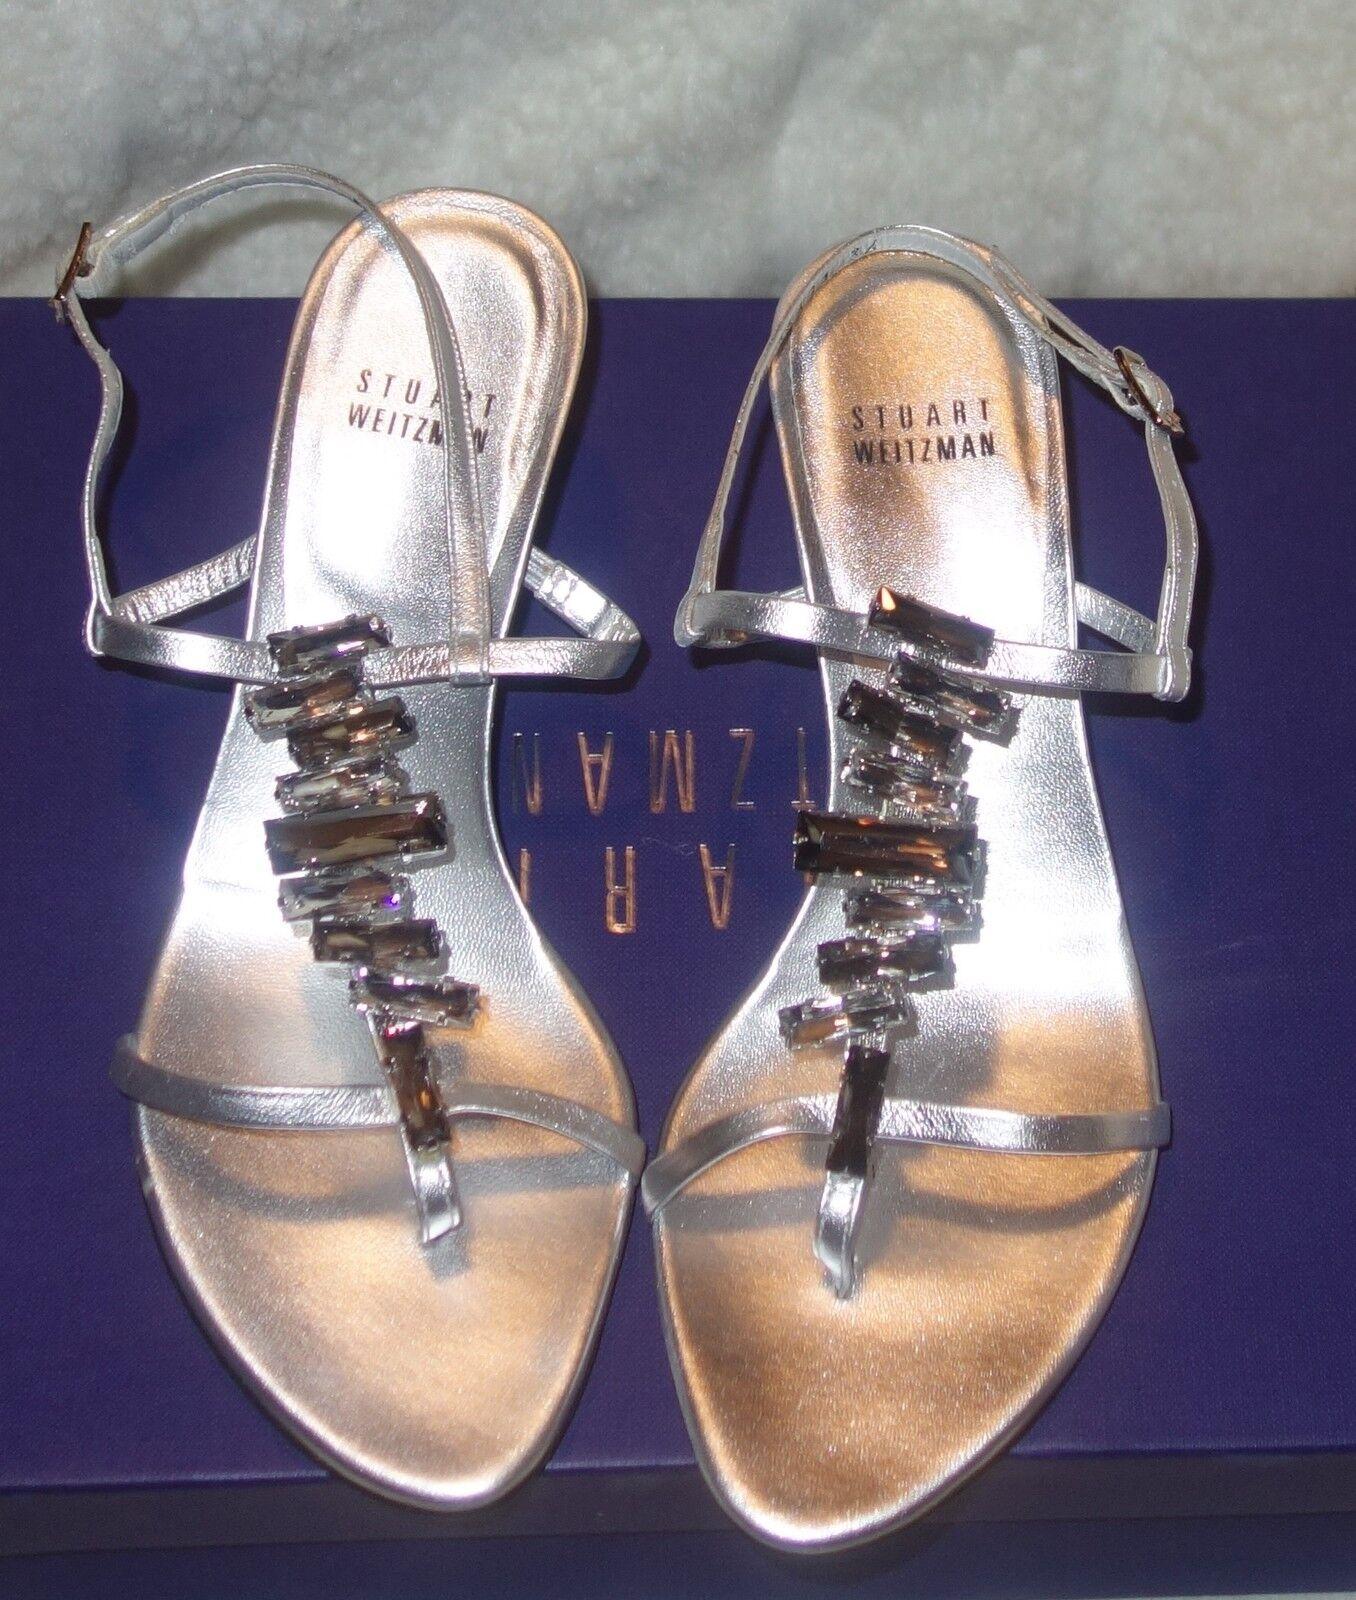 Stuart Weitzman Weitzman Weitzman cuero metálico plata adornan Enjoyado Sandalias talla 36 US talla 5.5  grandes ofertas